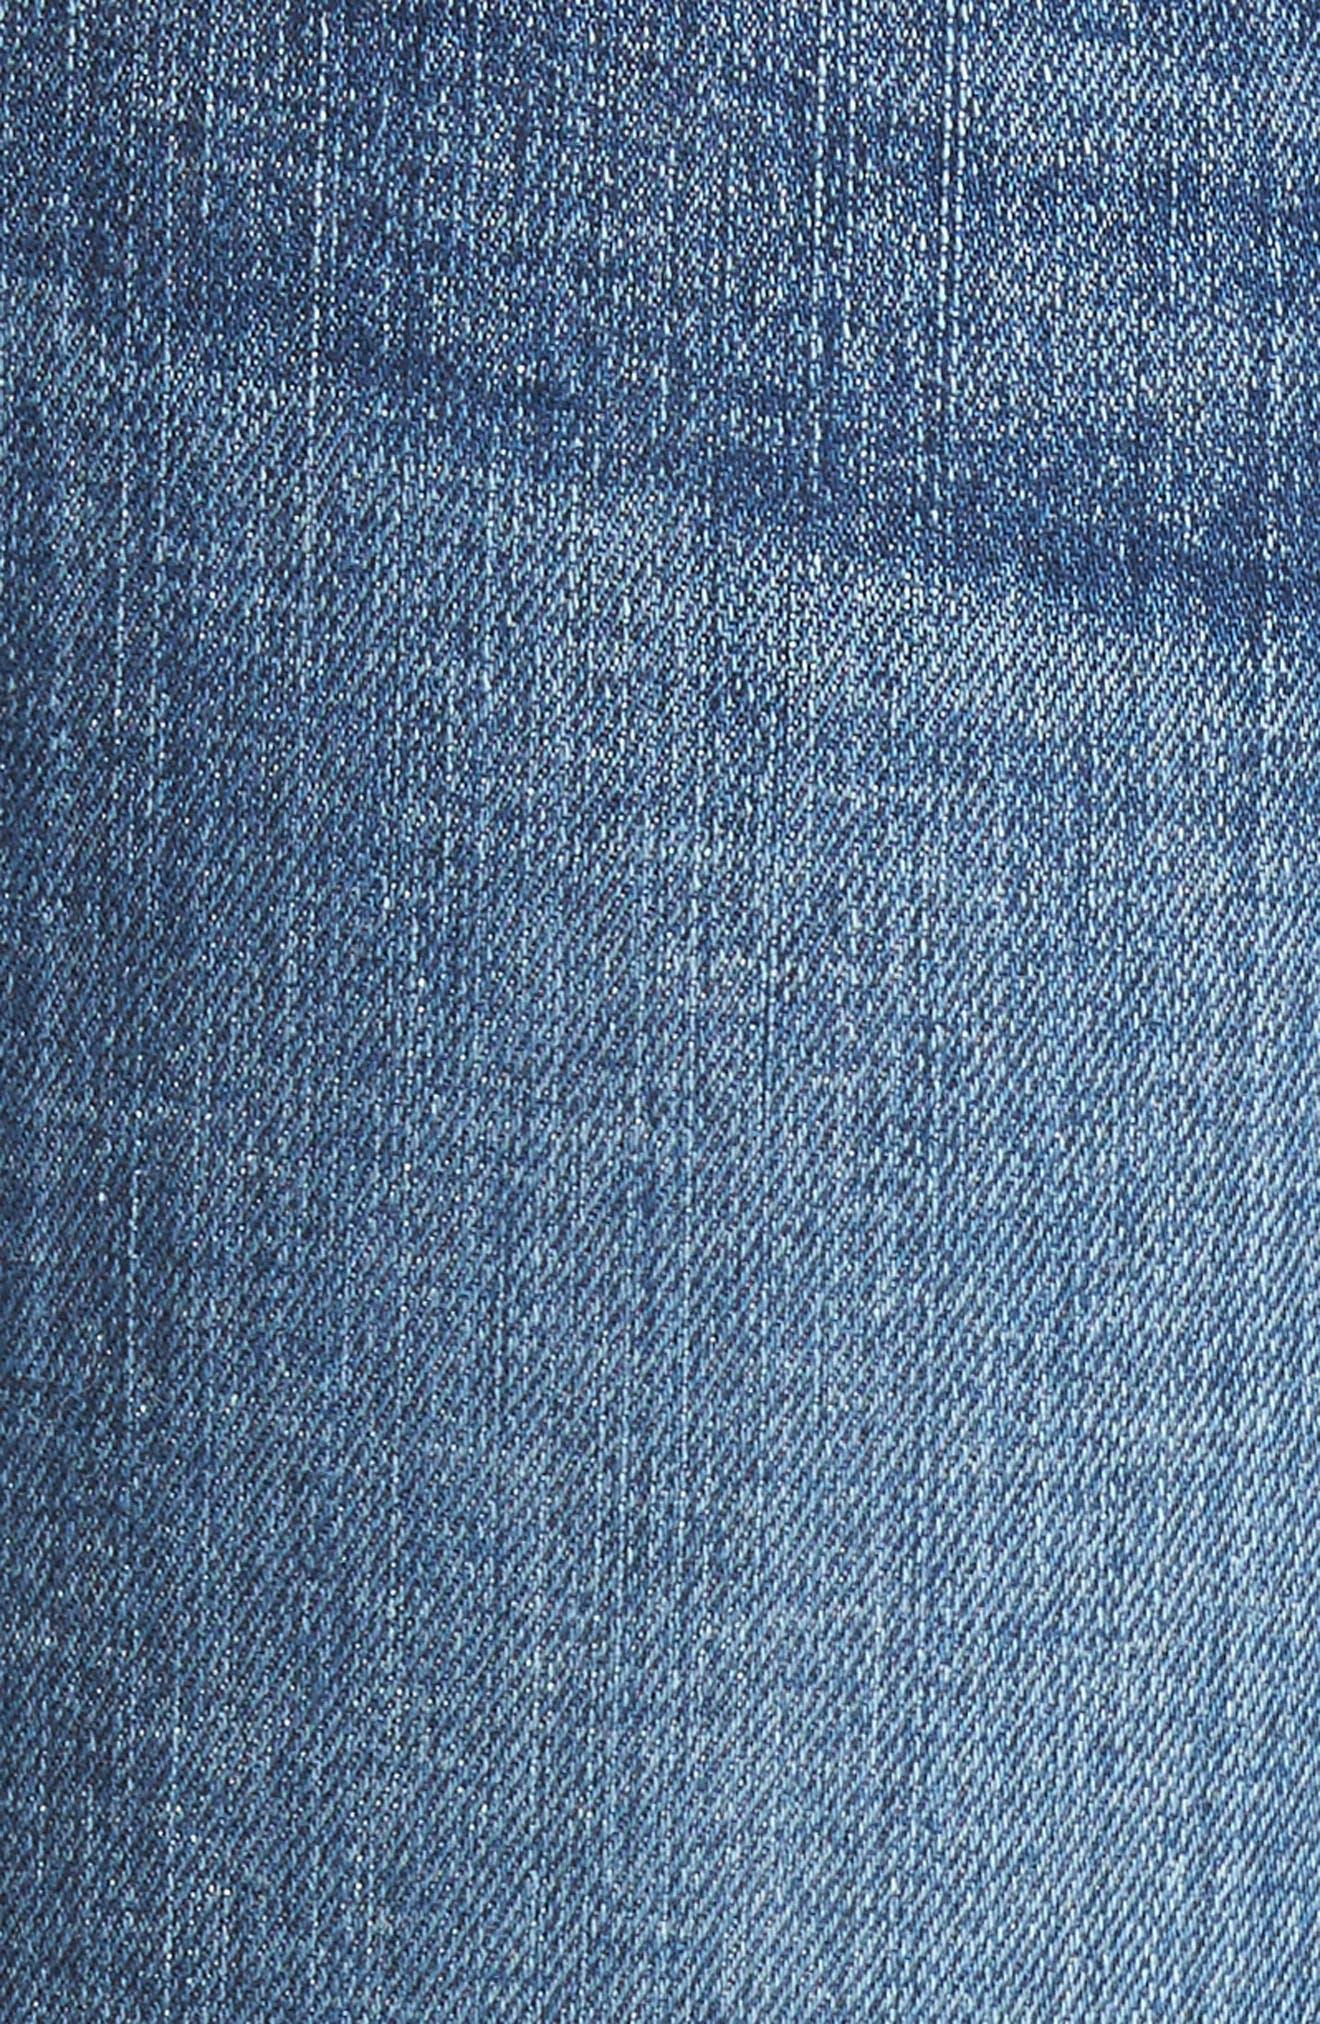 10-Inch Chewed Hem Skinny Jeans,                             Alternate thumbnail 5, color,                             400